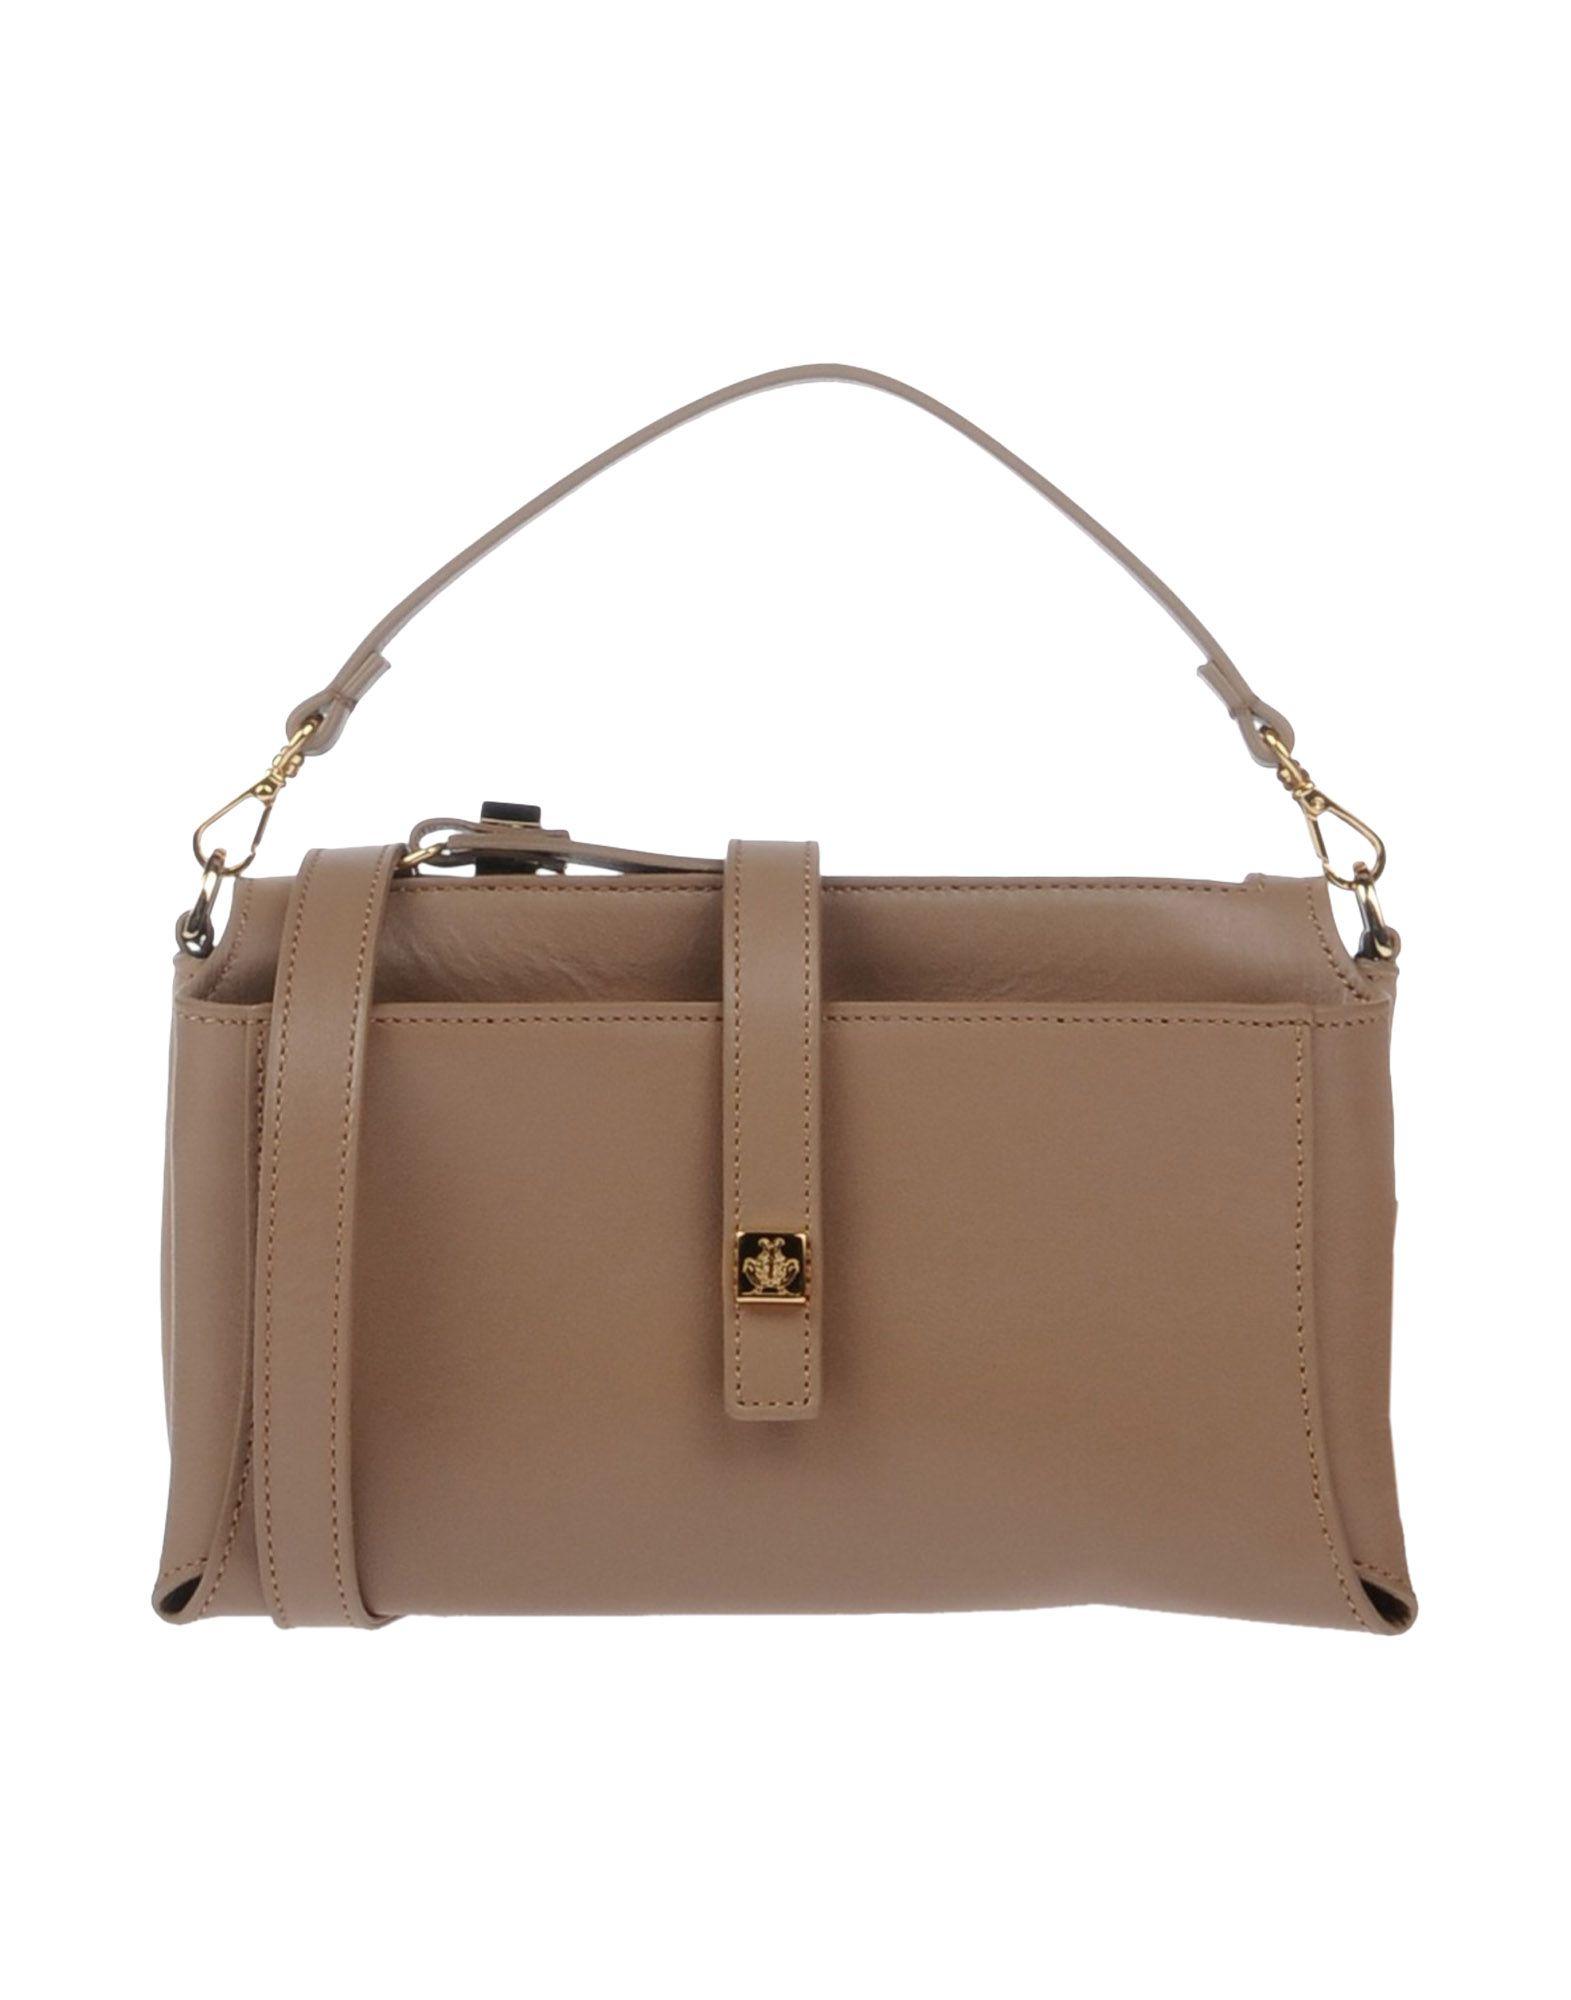 GIANCARLO PETRIGLIA Handbag in Khaki